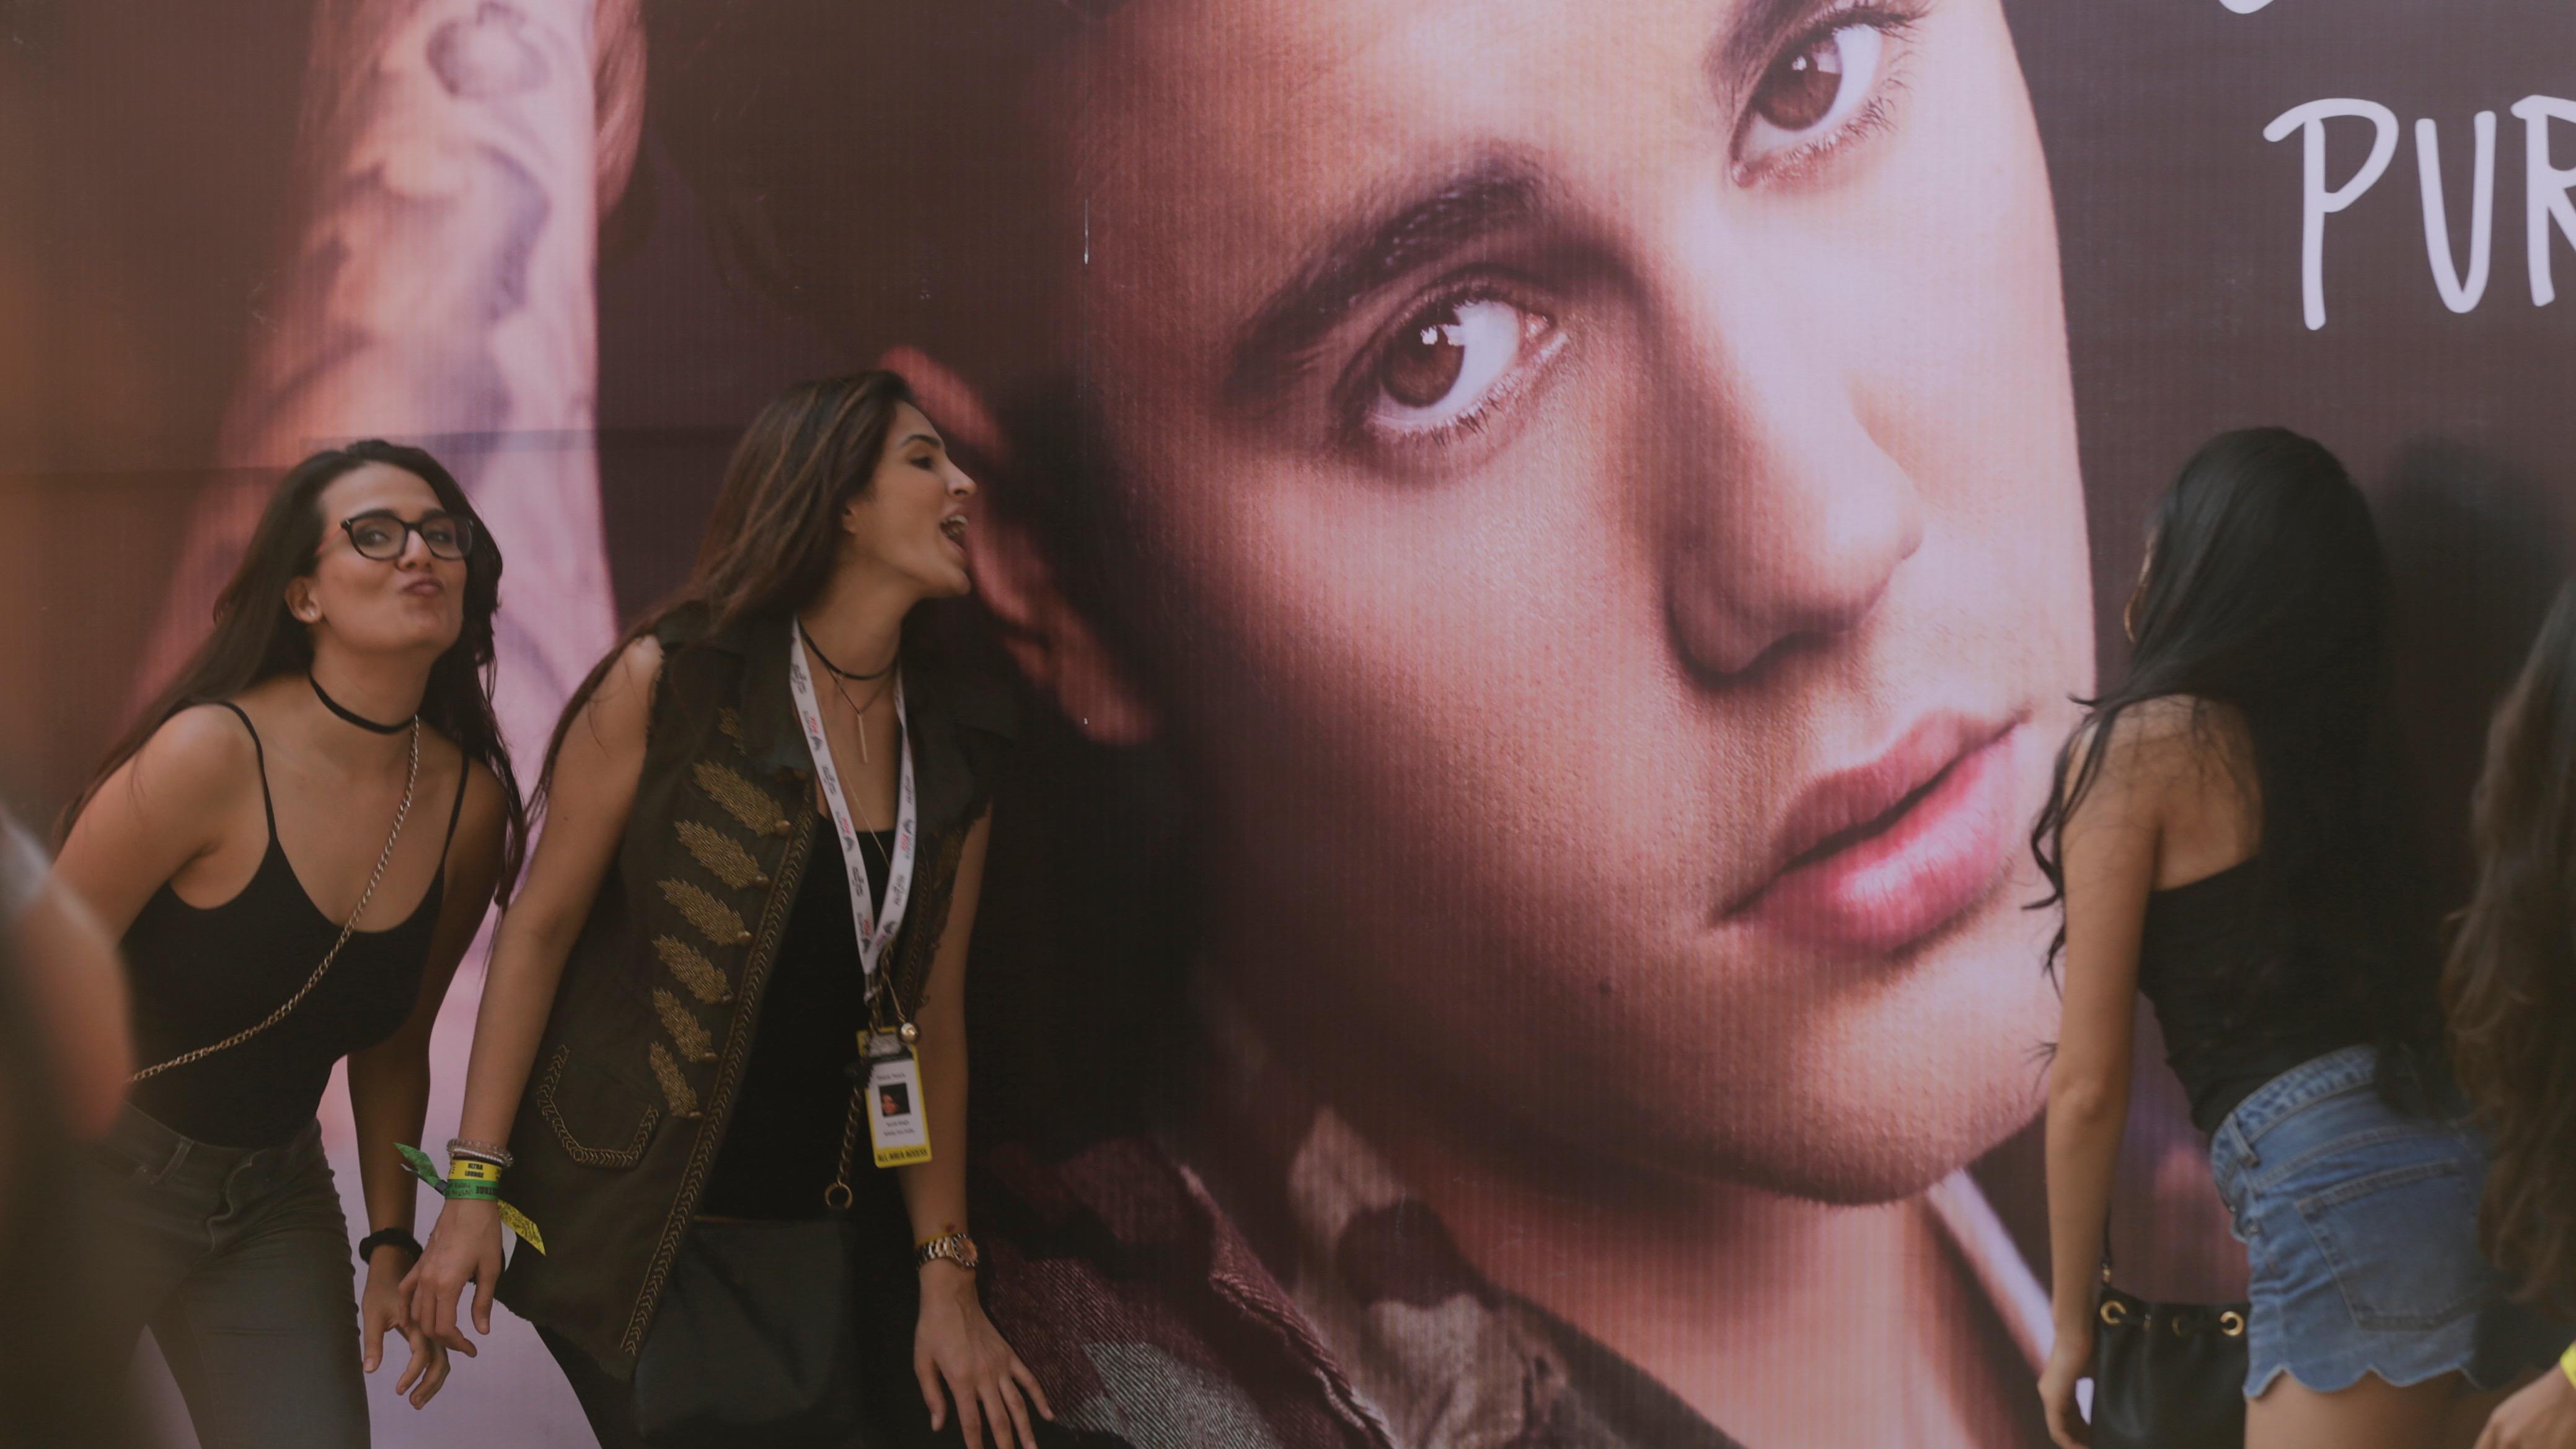 che z dating Justin Bieber GMU incontri